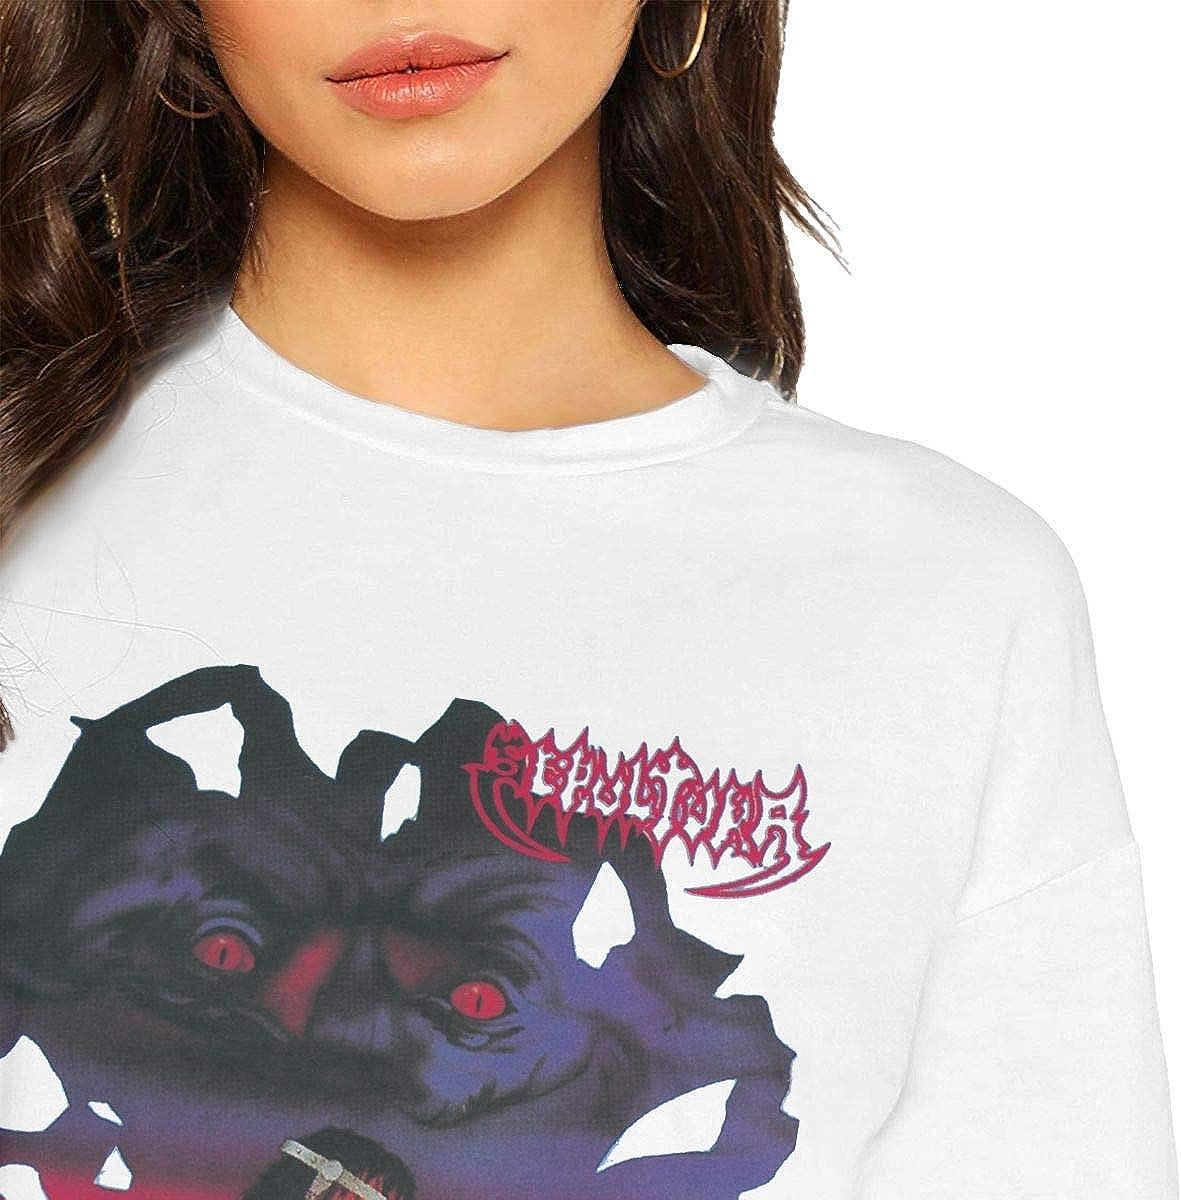 MonicaRDalton Sepultura Schizophrenia Woman Loose Short Sleeve Short Sleeve Leak Navel